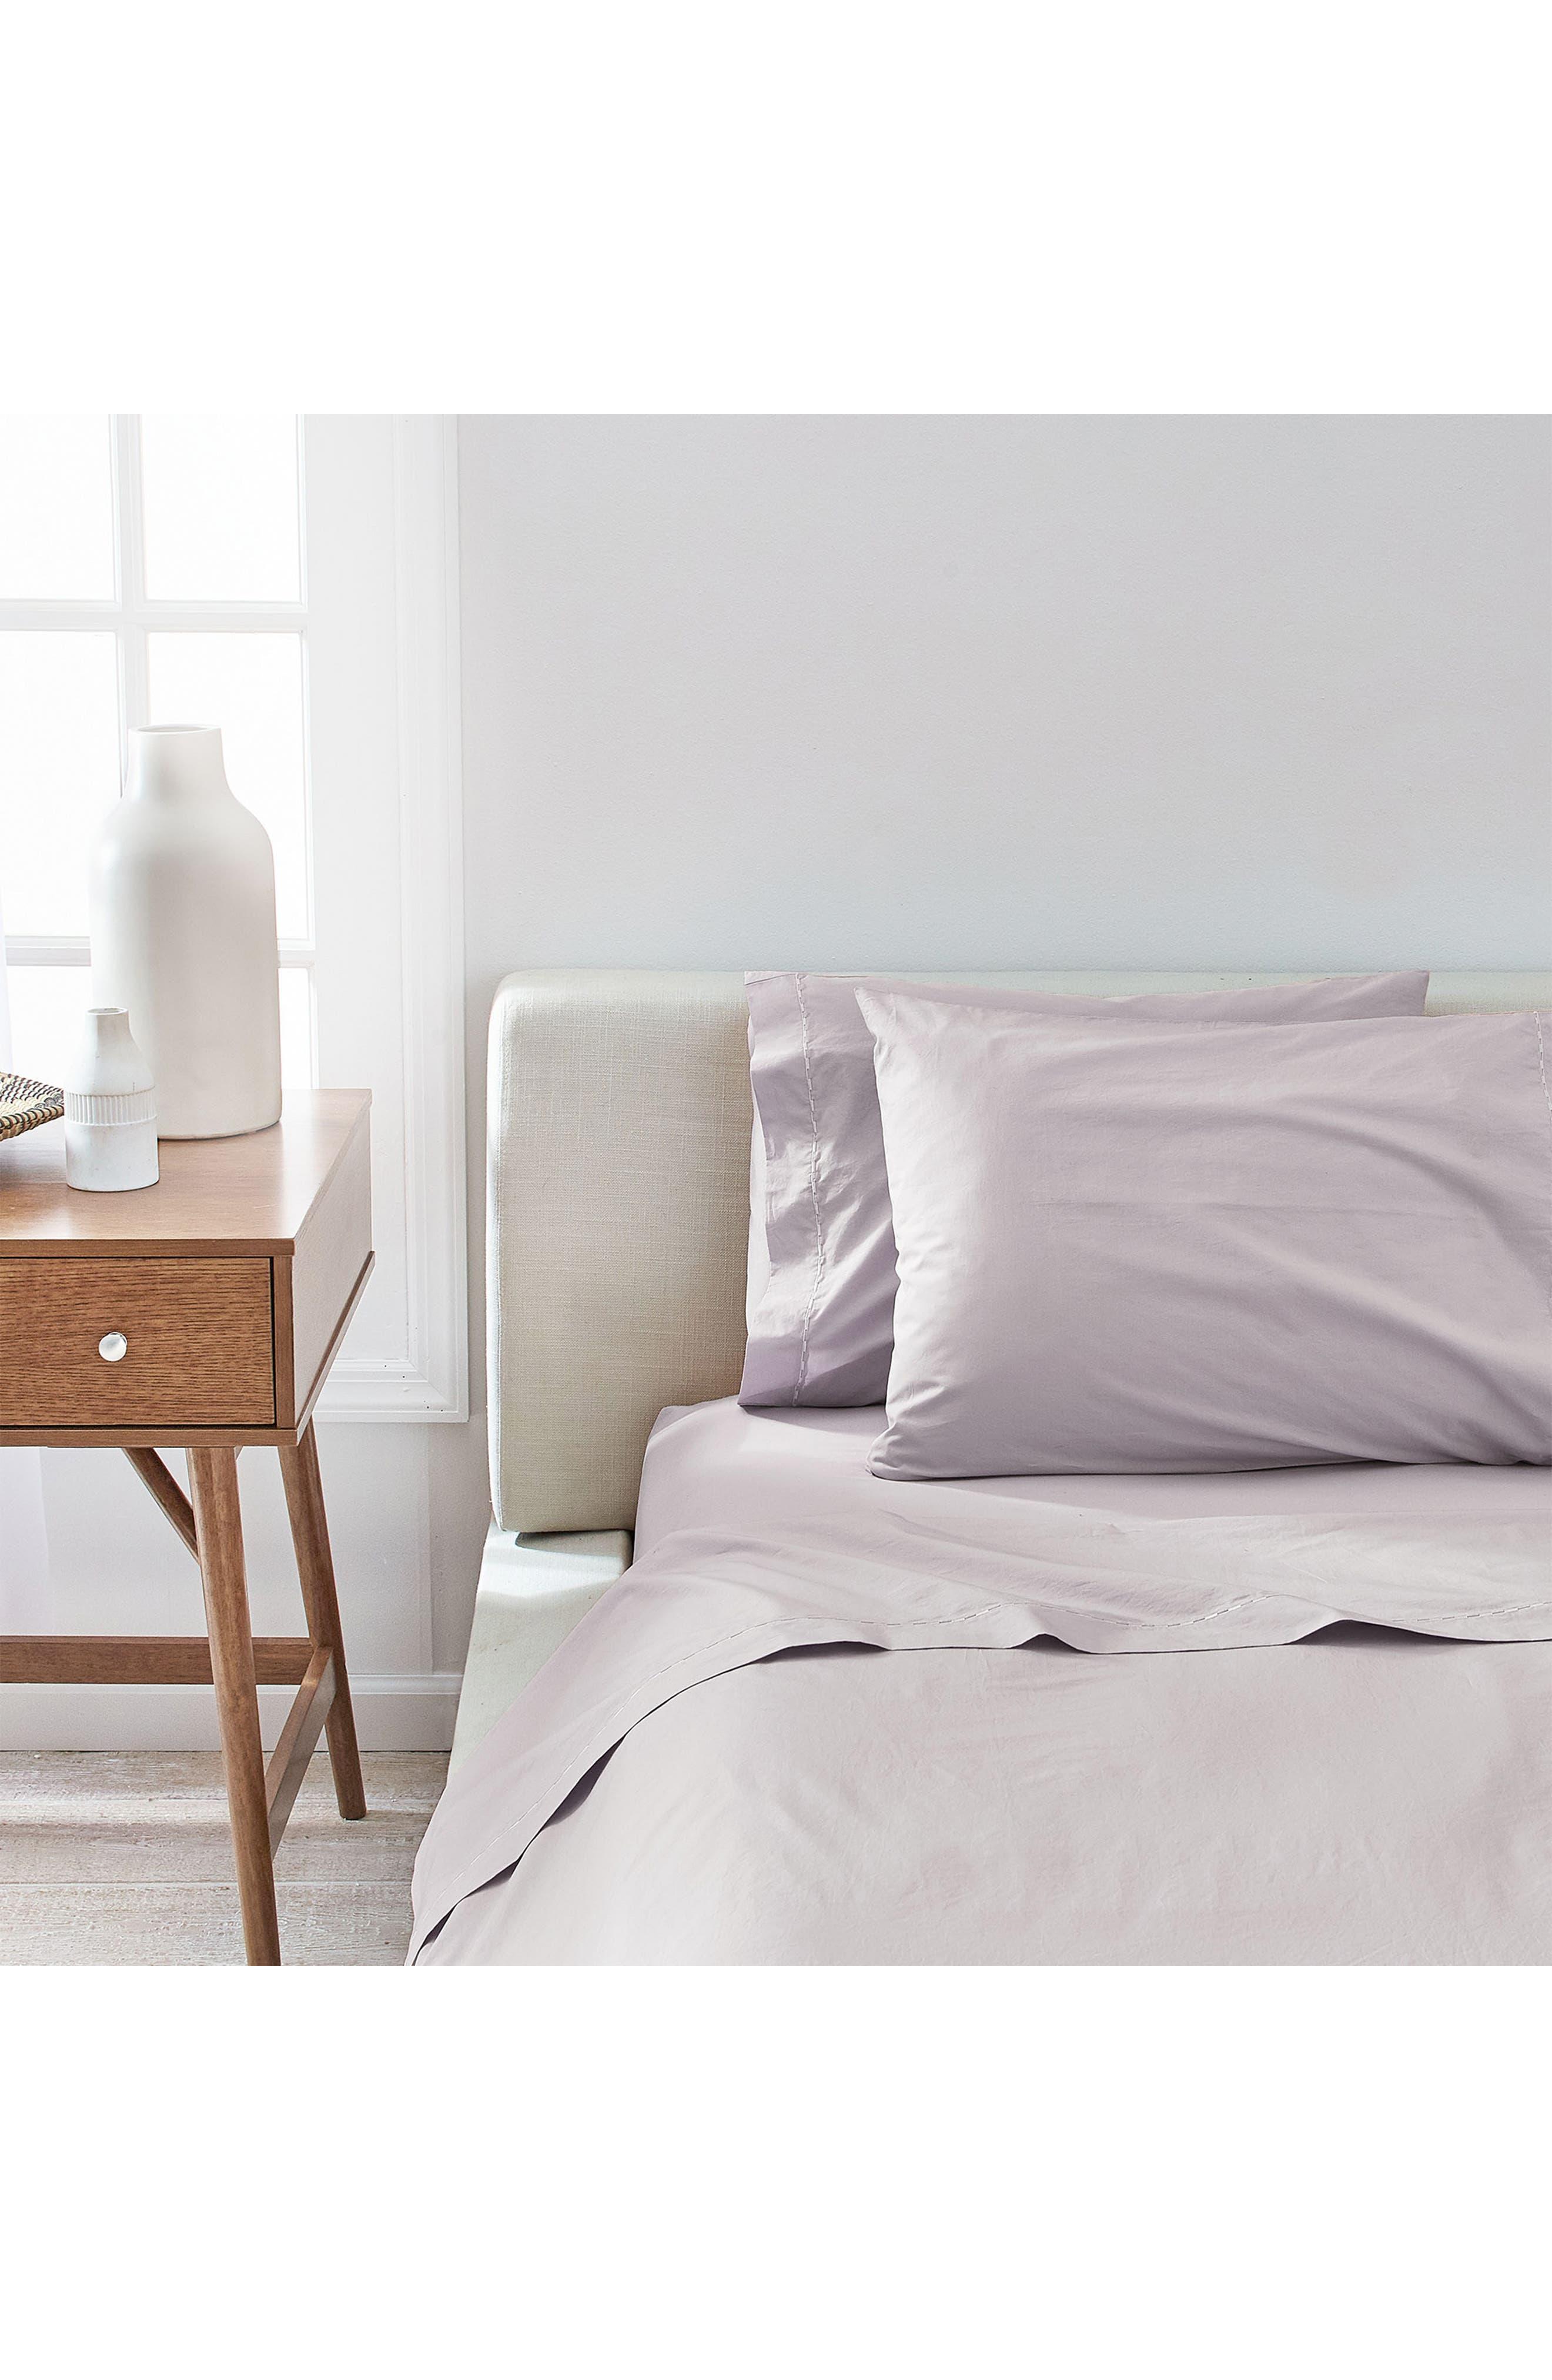 SPLENDID HOME DECOR, Spendid Home Decor Cotton Percale Pillowcases, Alternate thumbnail 3, color, 027